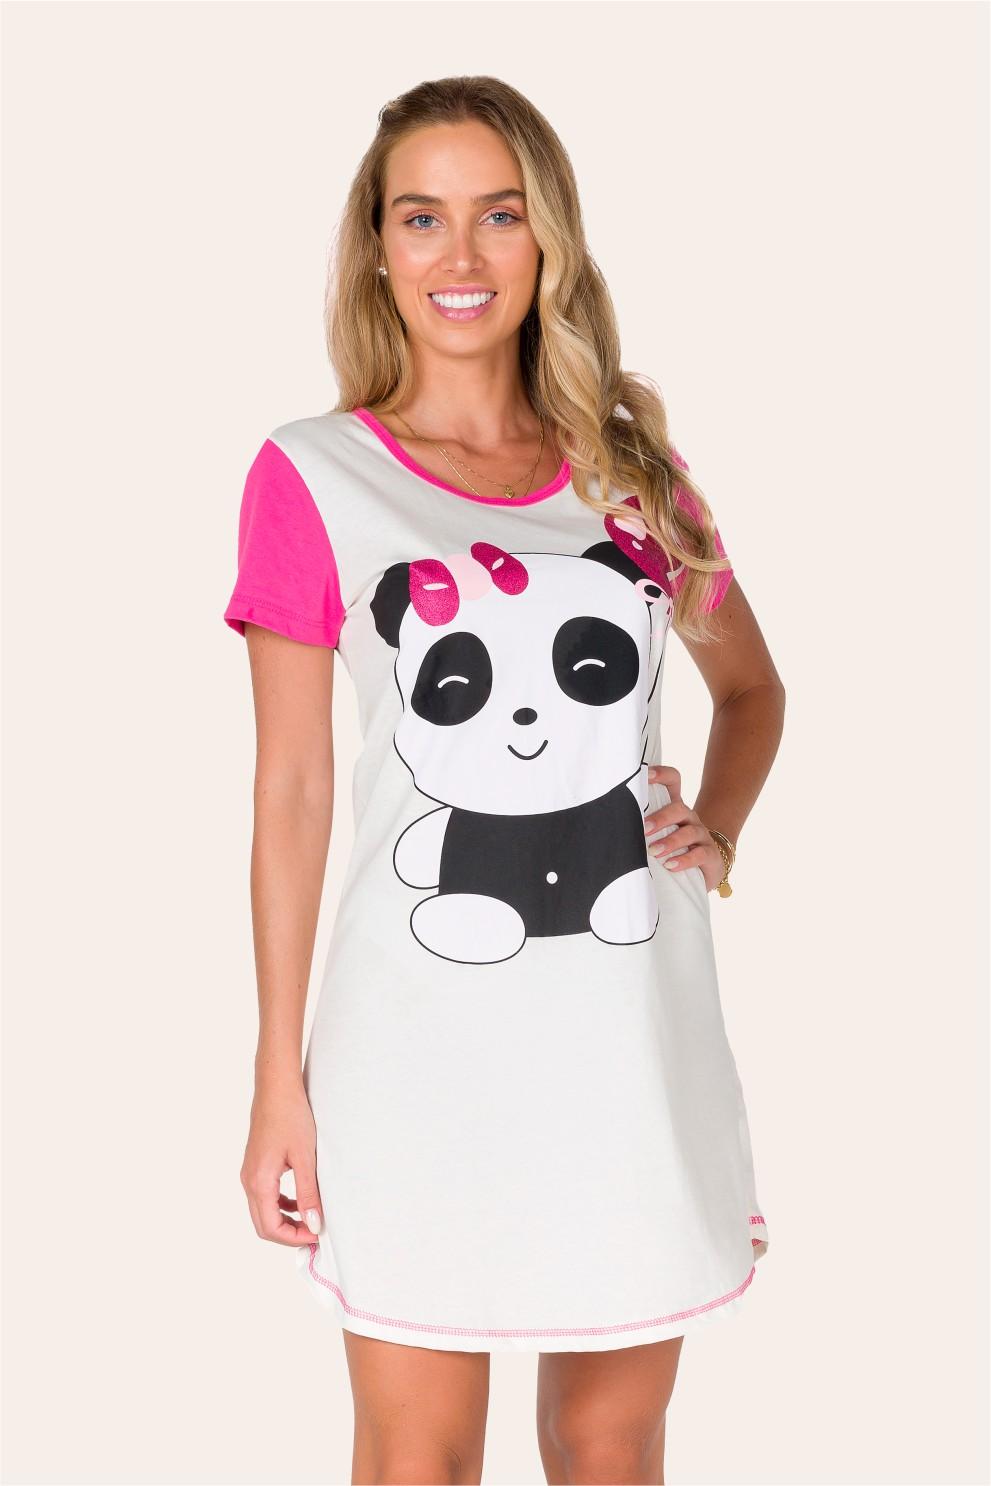 033/A - Camisola Adulto Panda